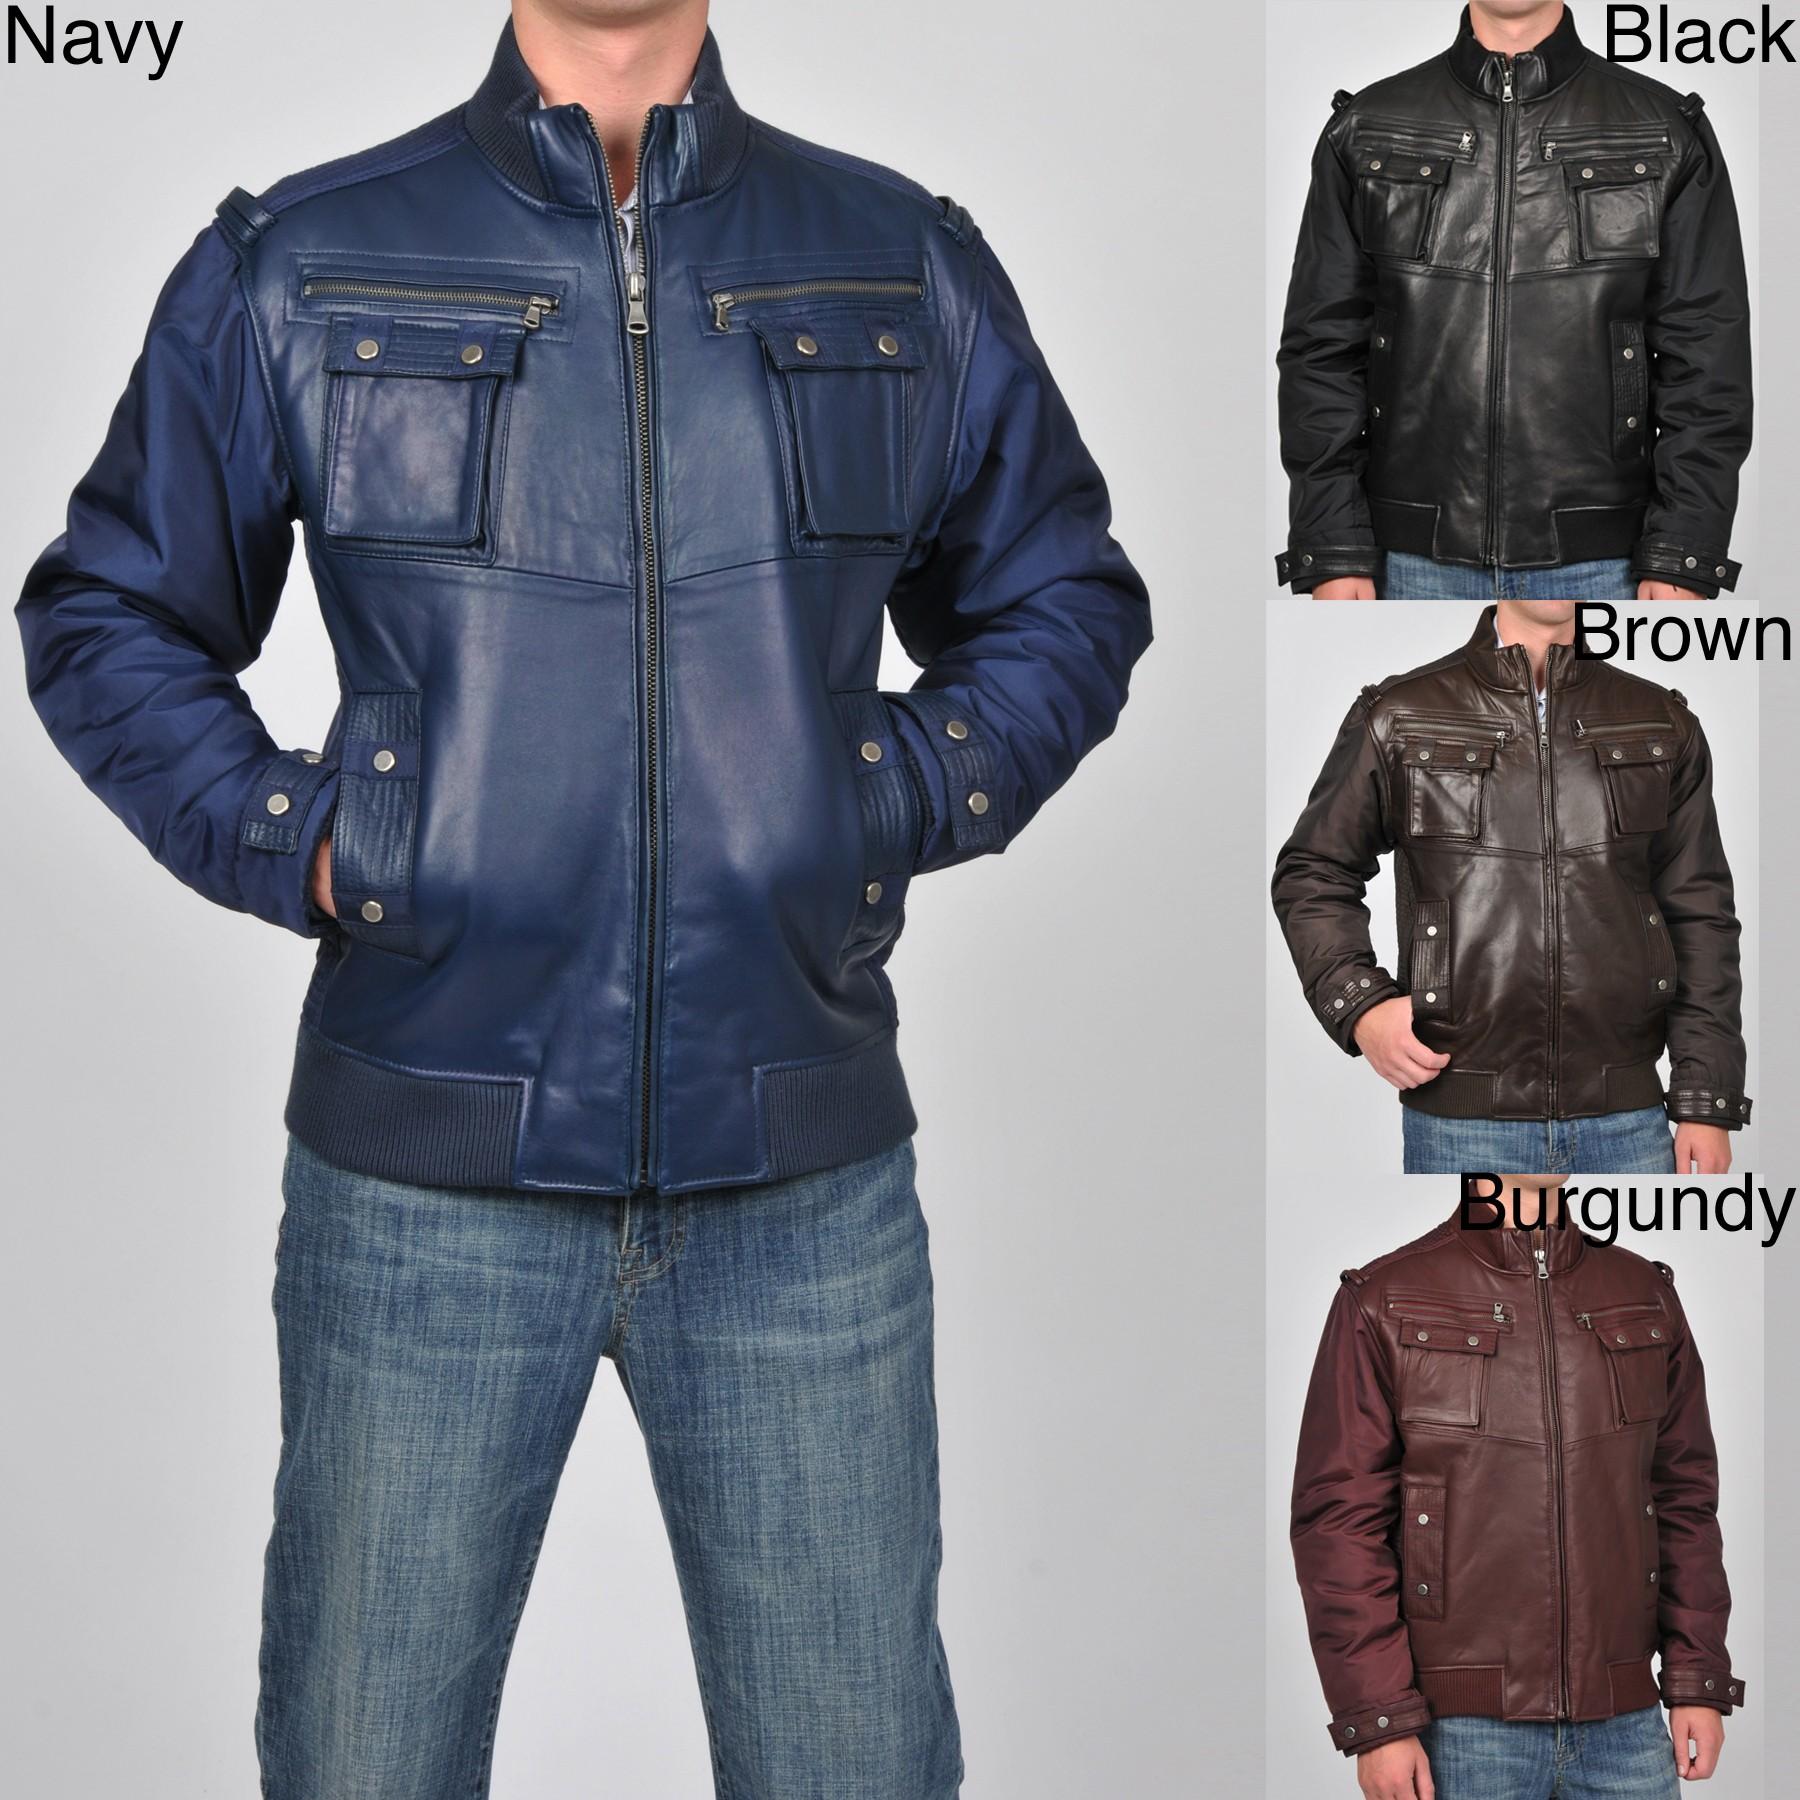 a4222672e Knoles & Carter Men's Big & Tall Leather Bomber Jacket